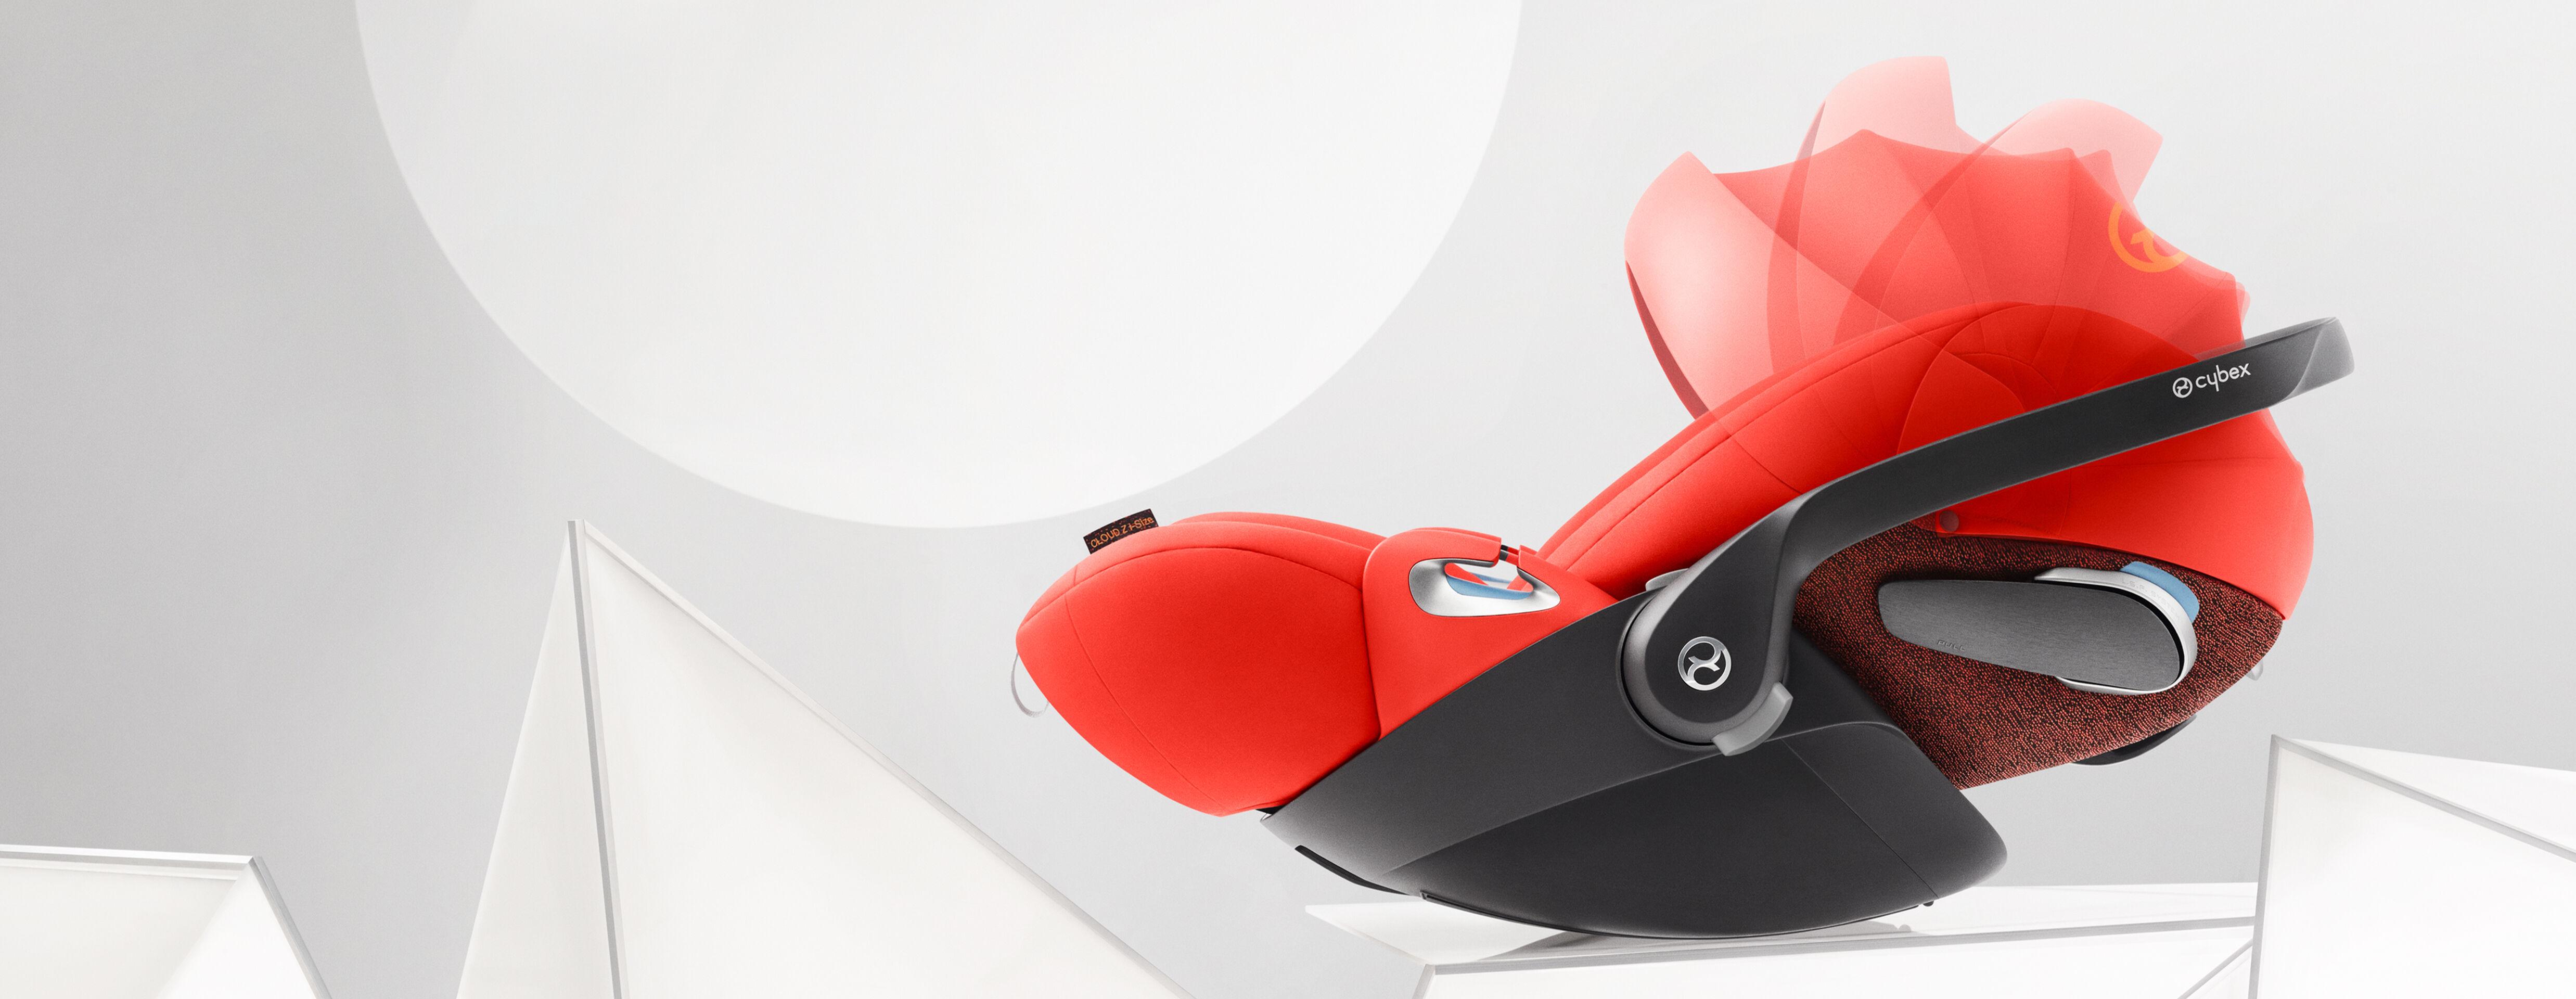 Cybex Platinum Cloud Z i-Size Car Seats Premium Sun and Wind Protection Banner